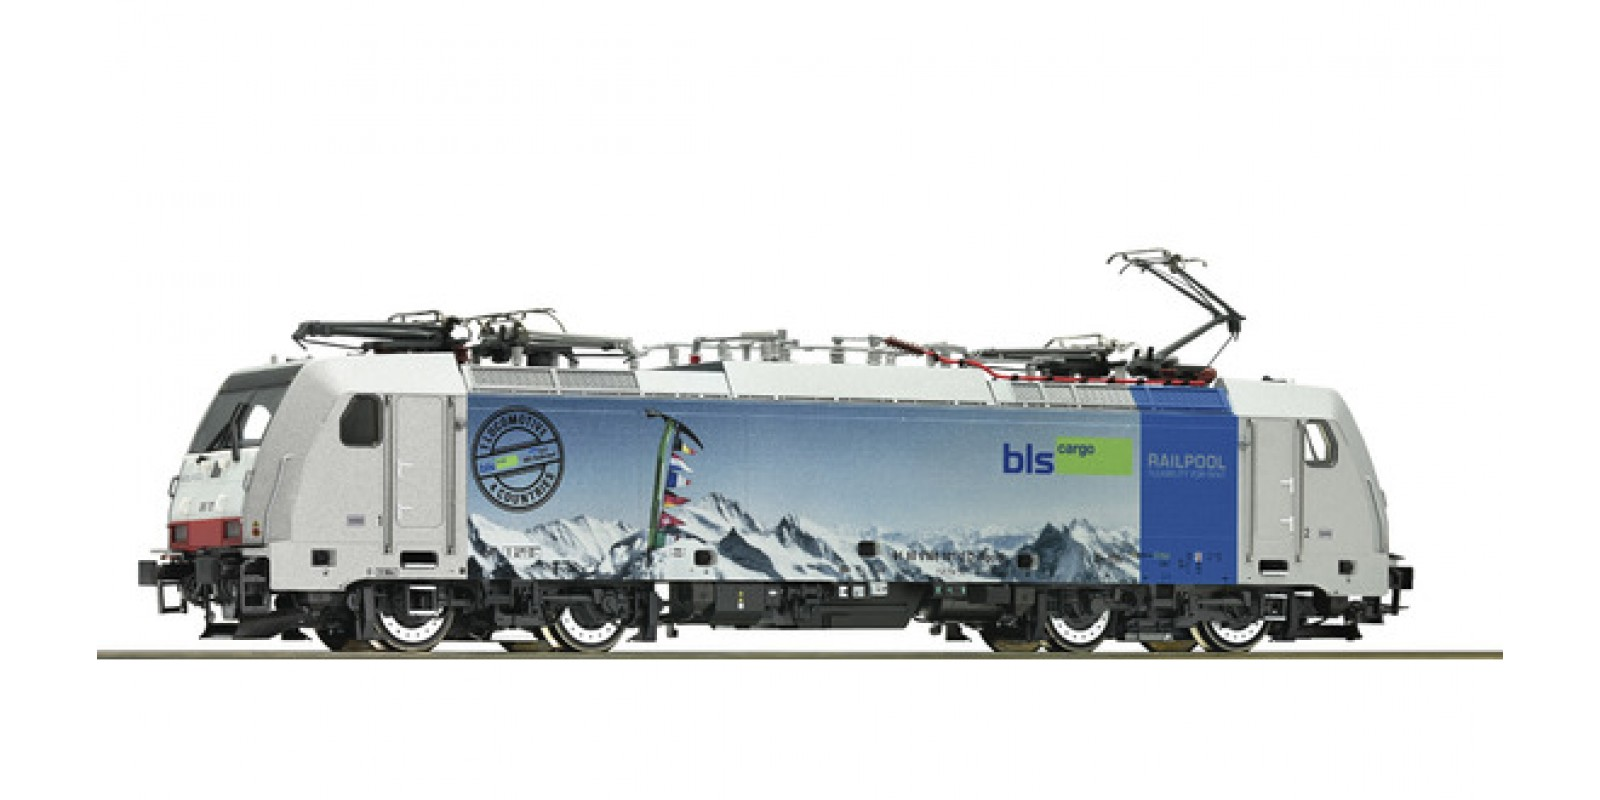 RO79666 - Electric locomotive class 186, Railpool